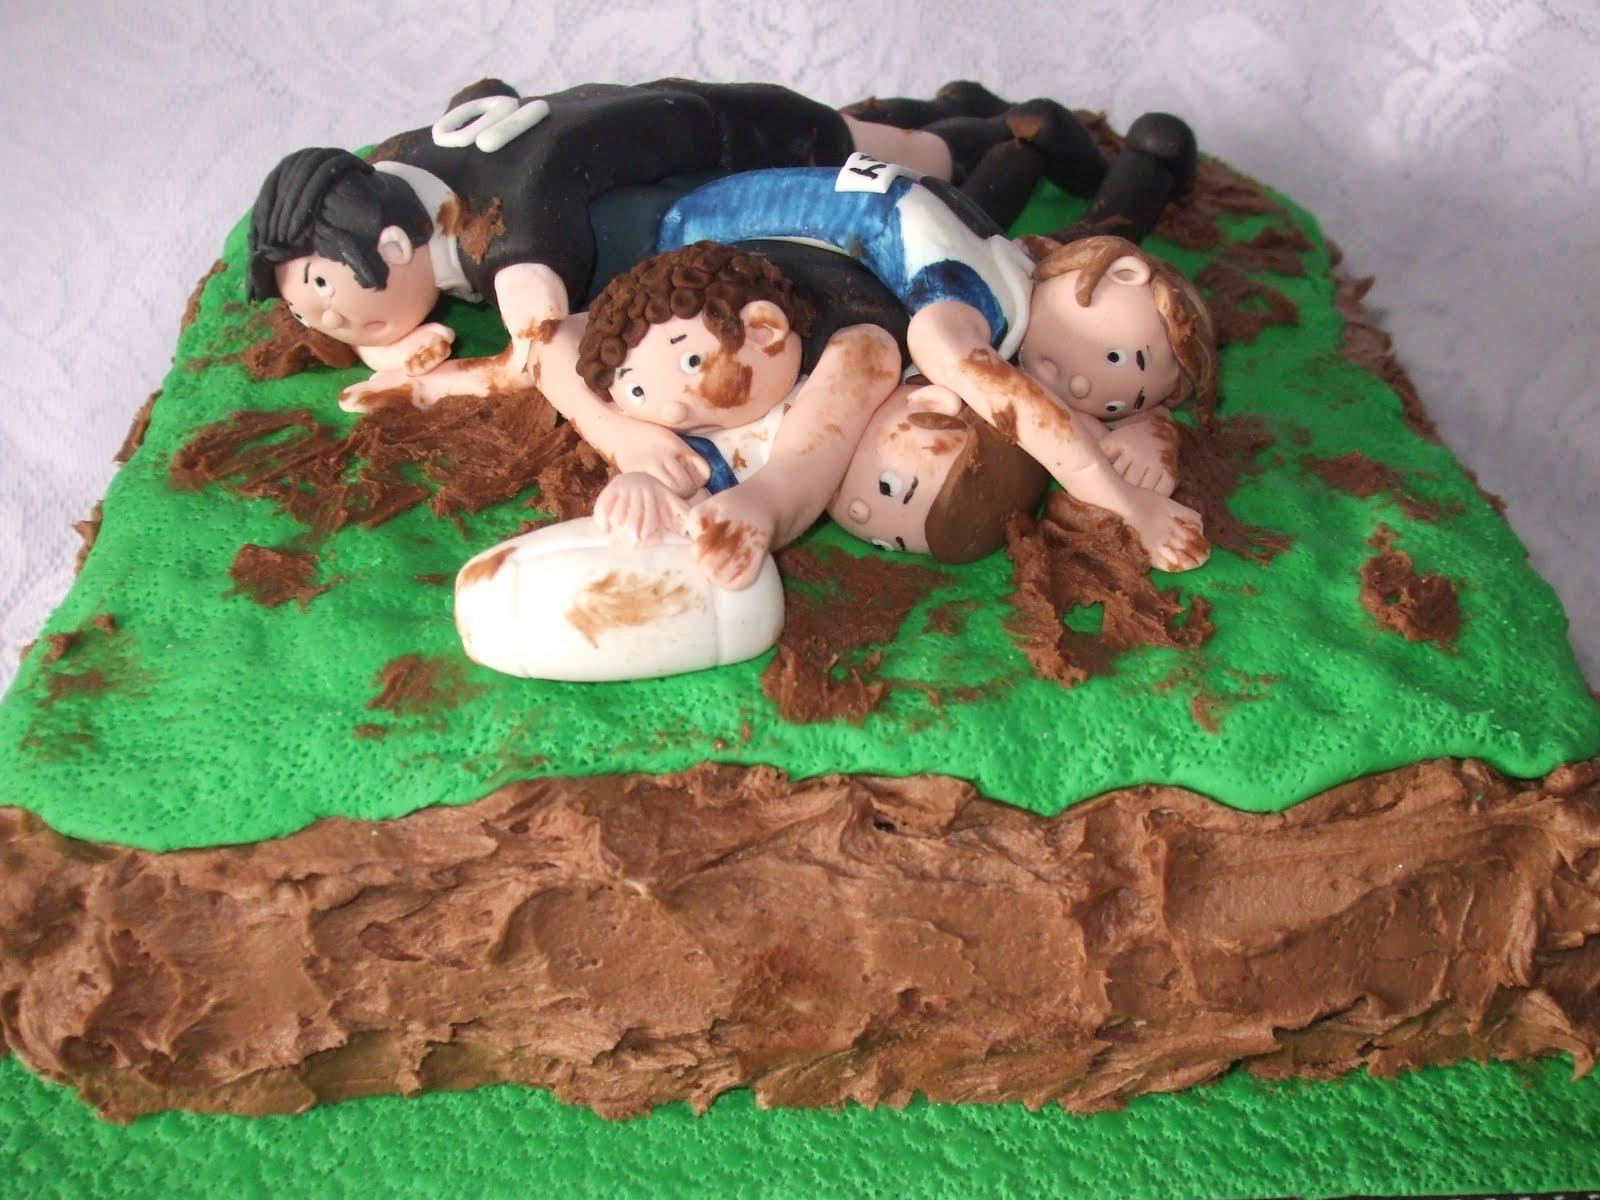 Fun Decorating: Brad's Rugby Cake